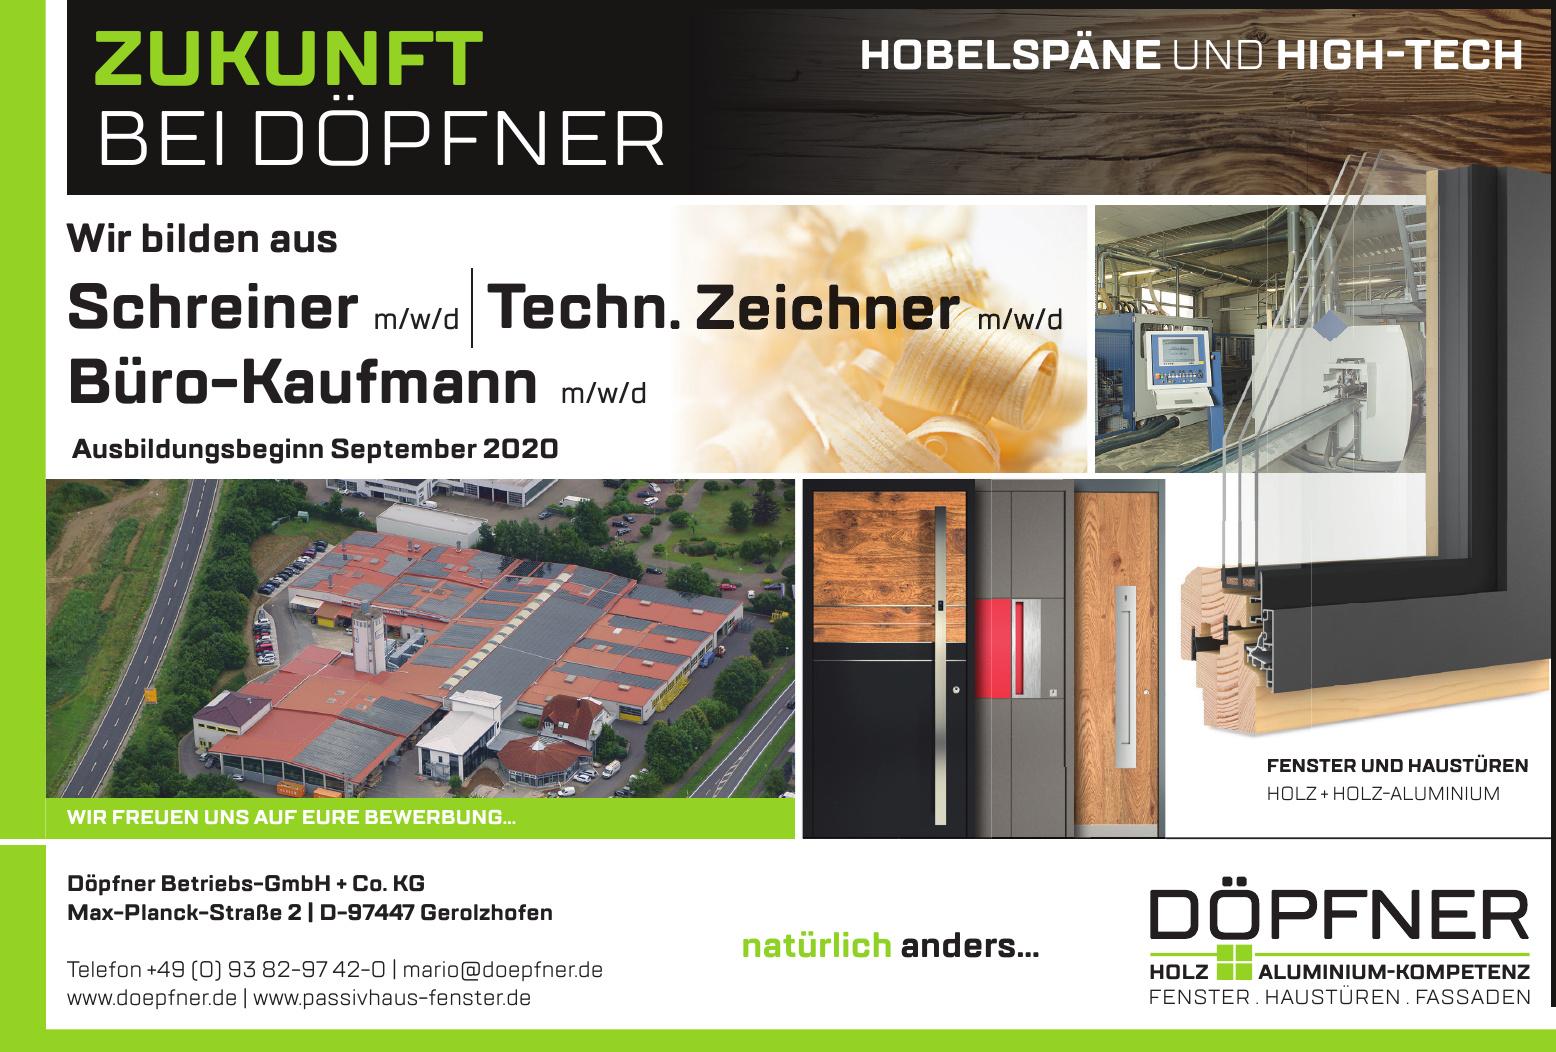 Döpfner Betriebs-GmbH + Co. KG